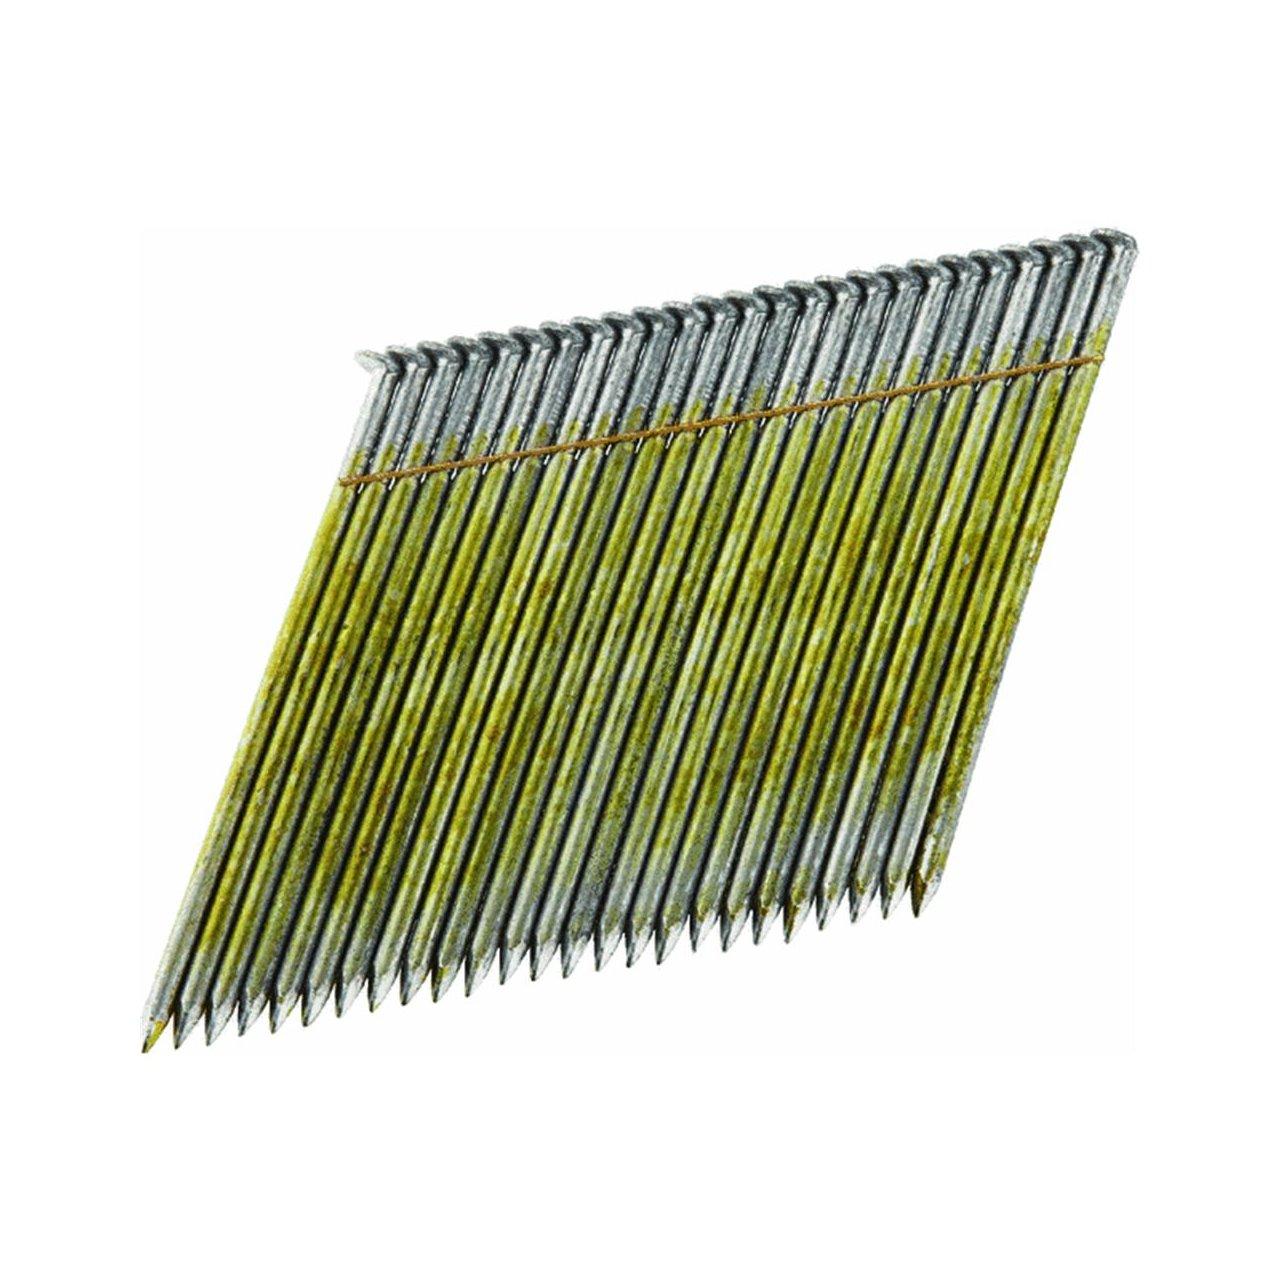 Cheap 16d Framing Nails, find 16d Framing Nails deals on line at ...